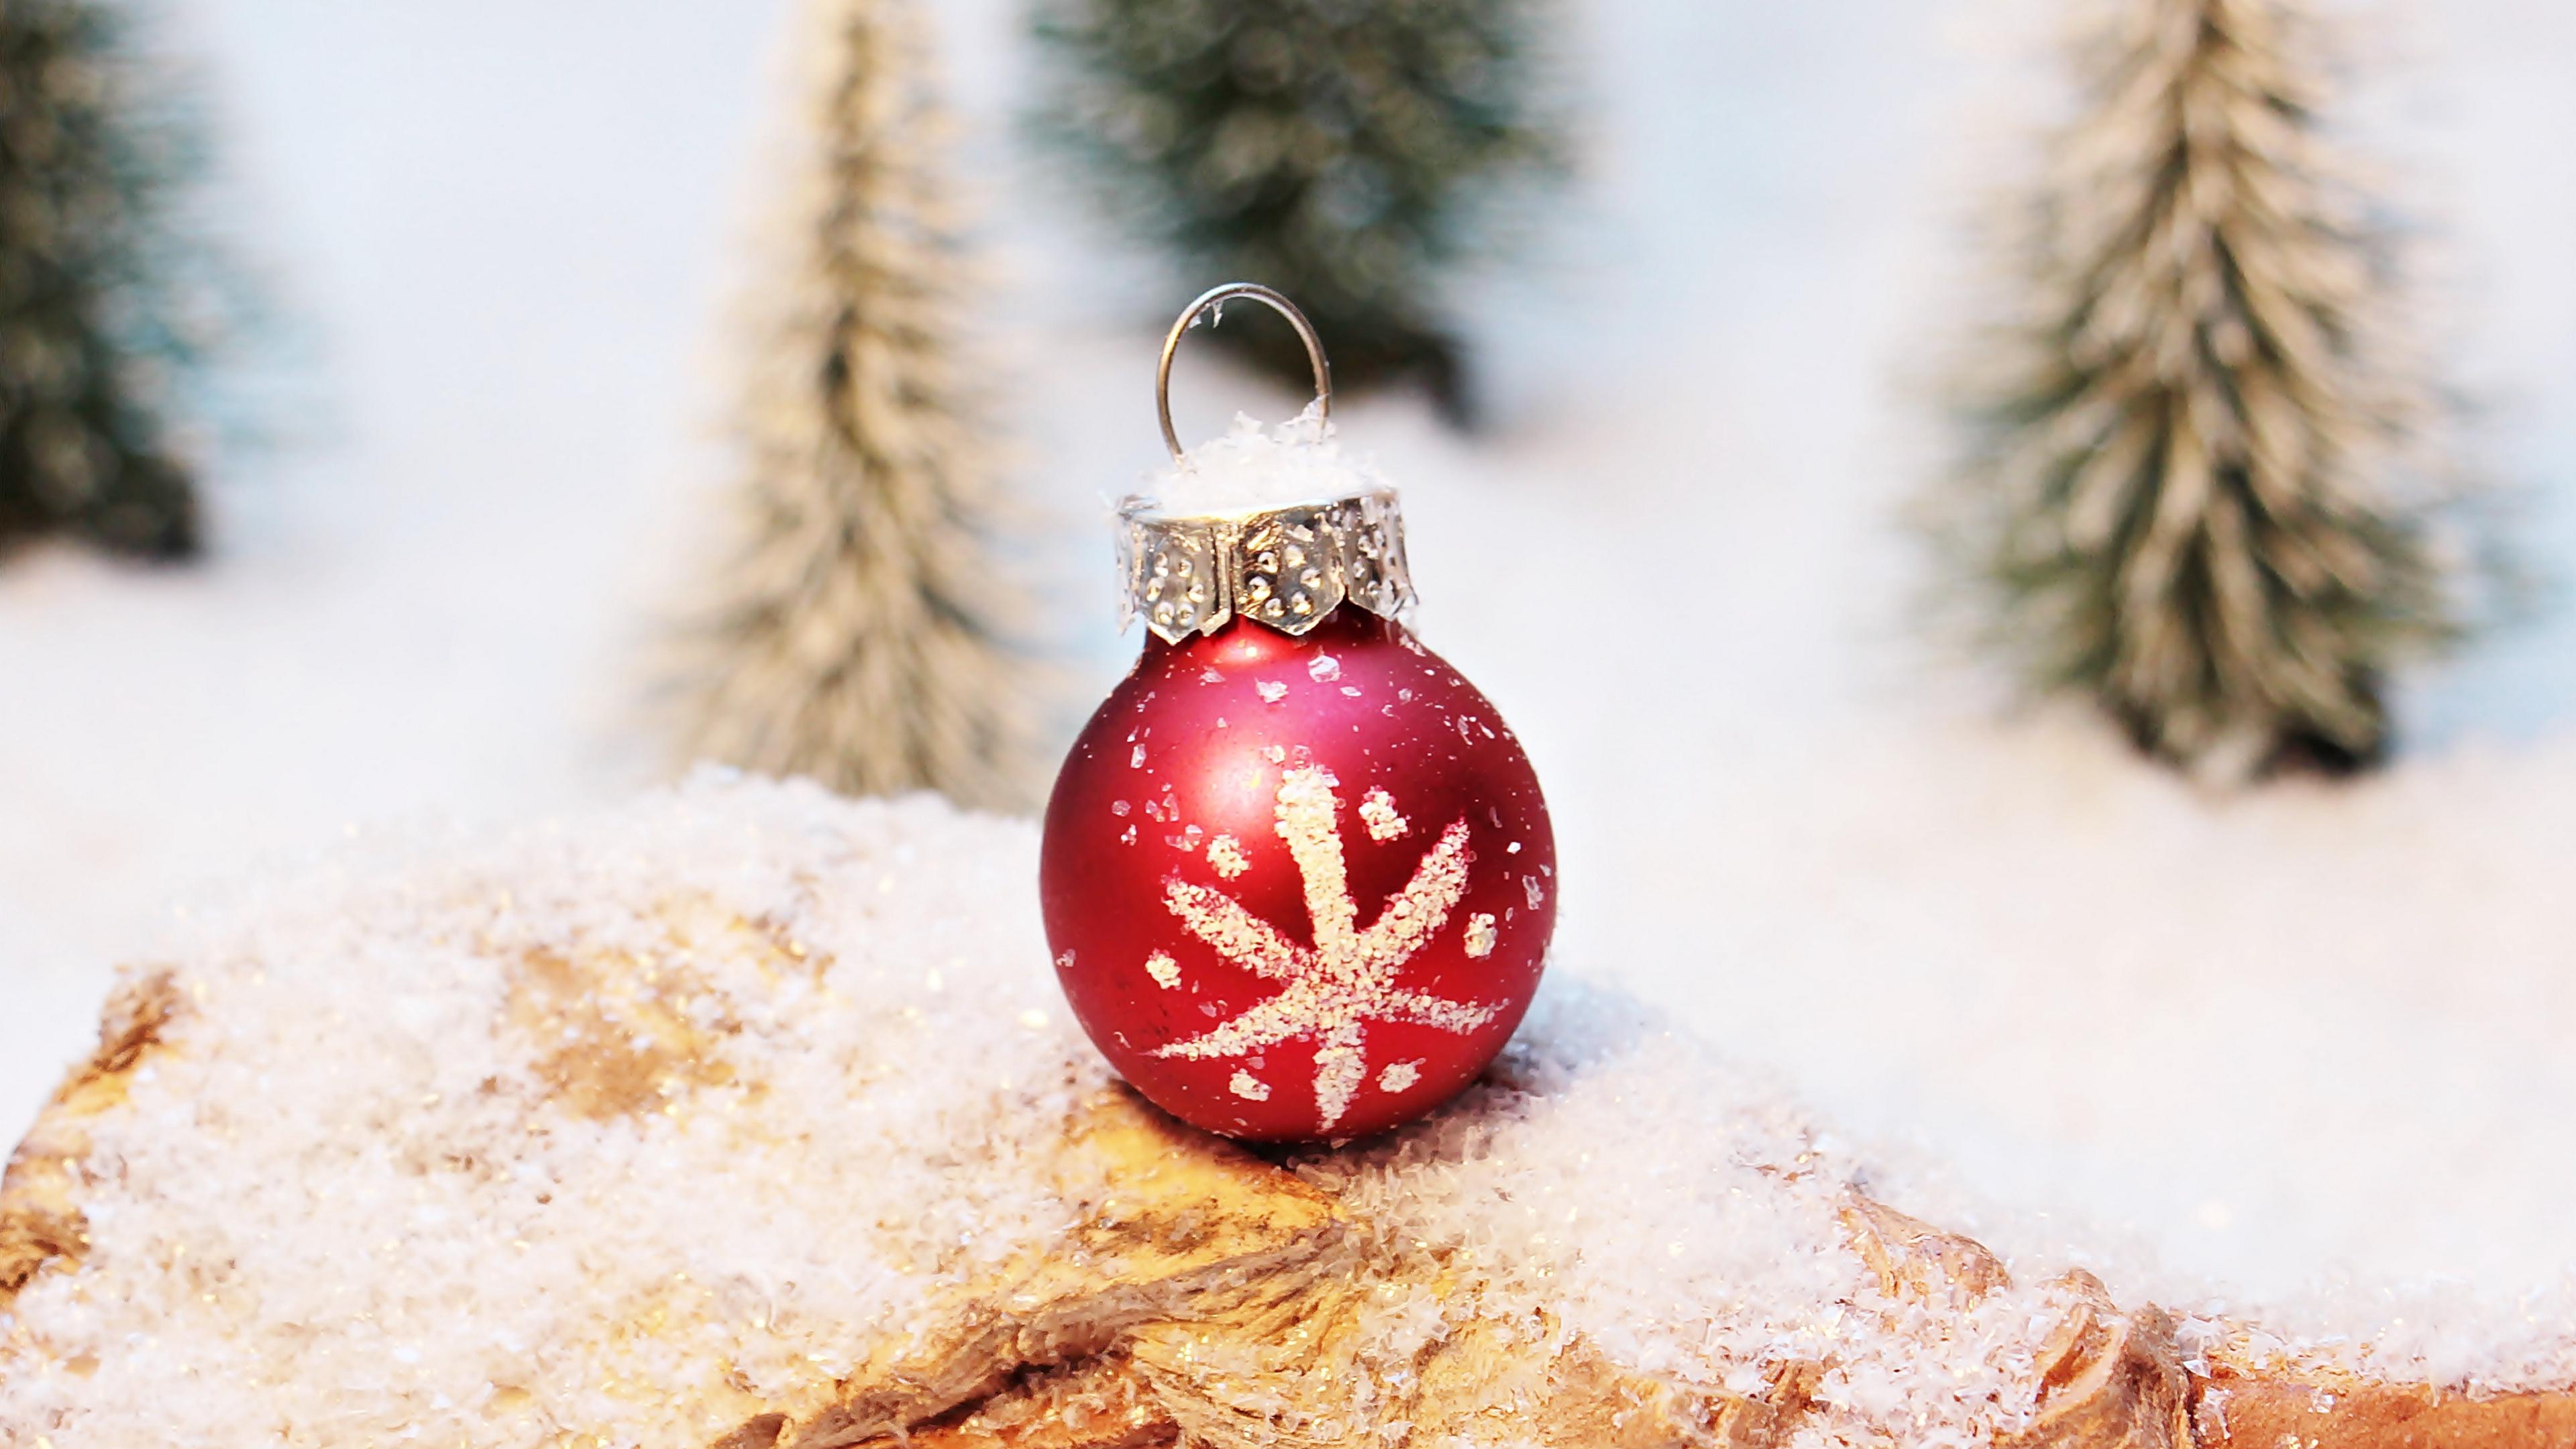 christmas decorations ball snowflake winter christmas new year 4k 1538344688 - christmas decorations, ball, snowflake, winter, christmas, new year 4k - snowflake, christmas decorations, Ball